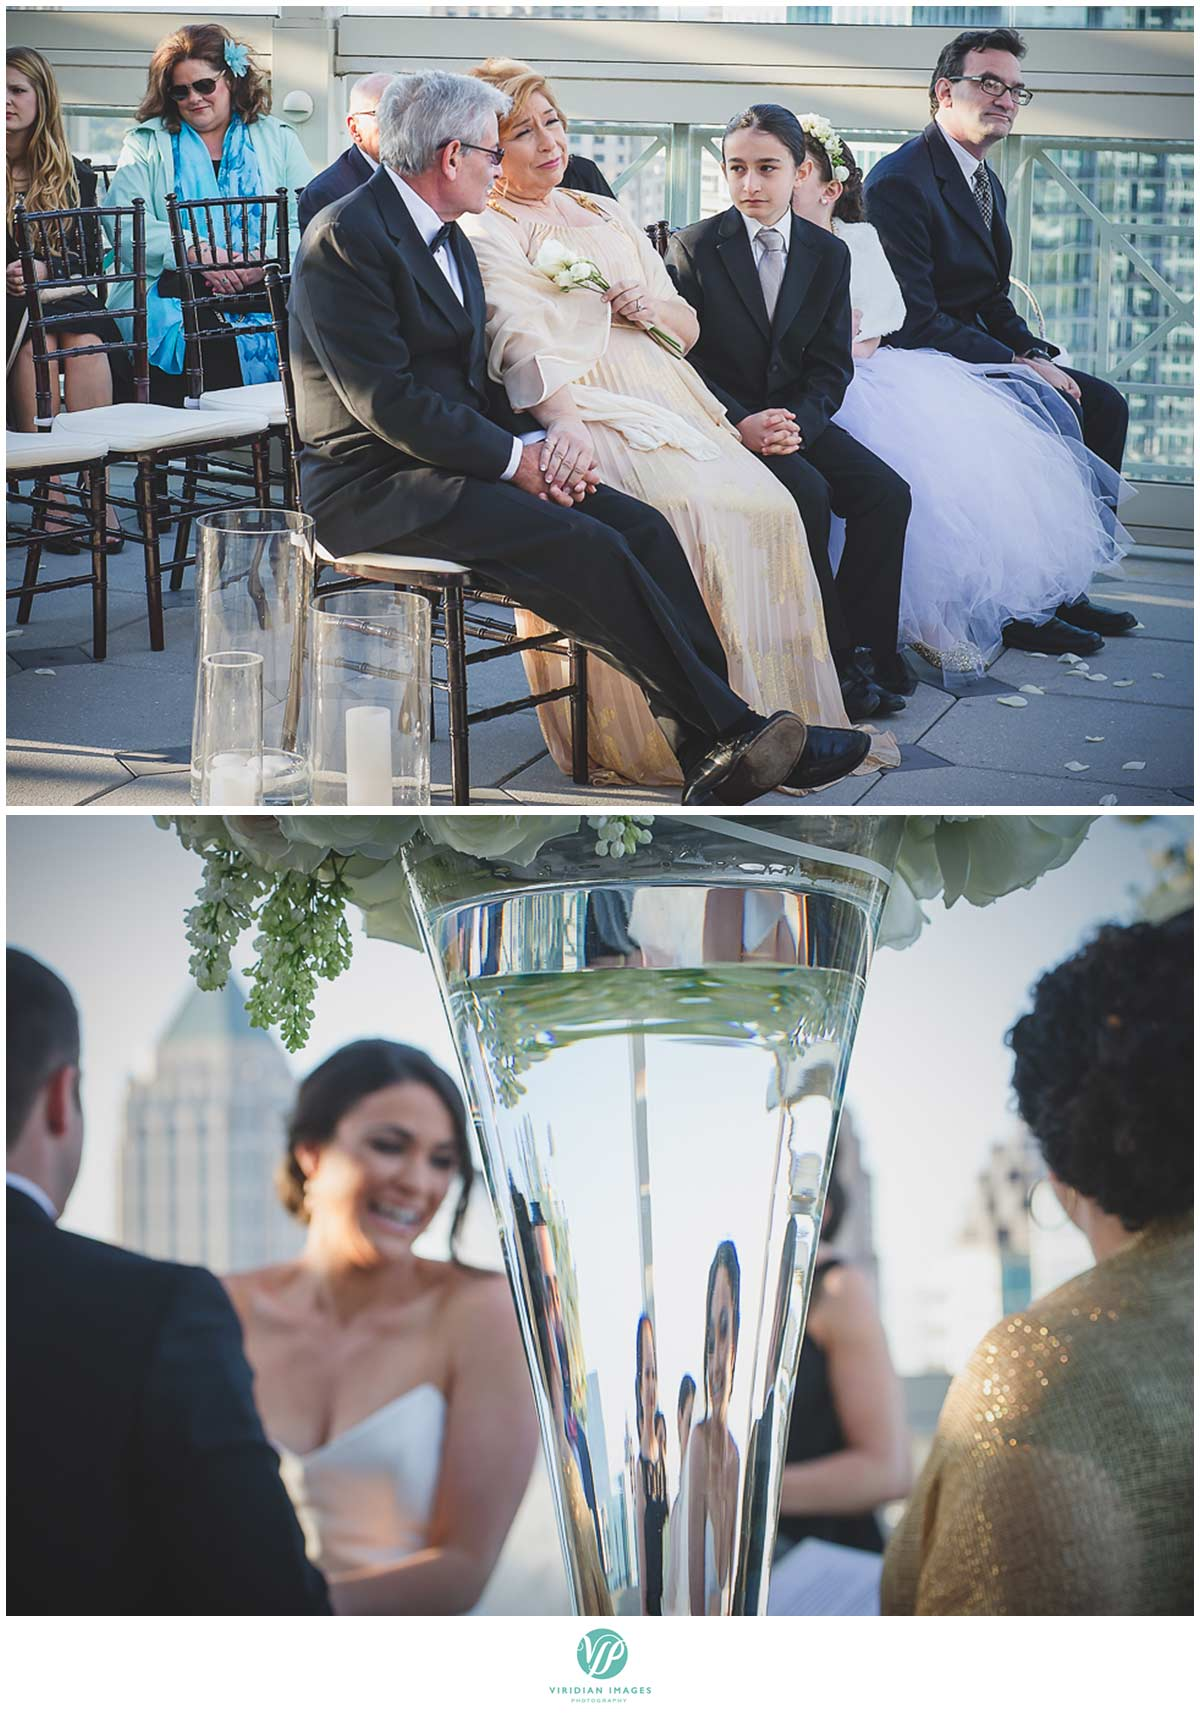 Peachtree_Club_Atlanta_Wedding_Viridian_Images_Photography-27